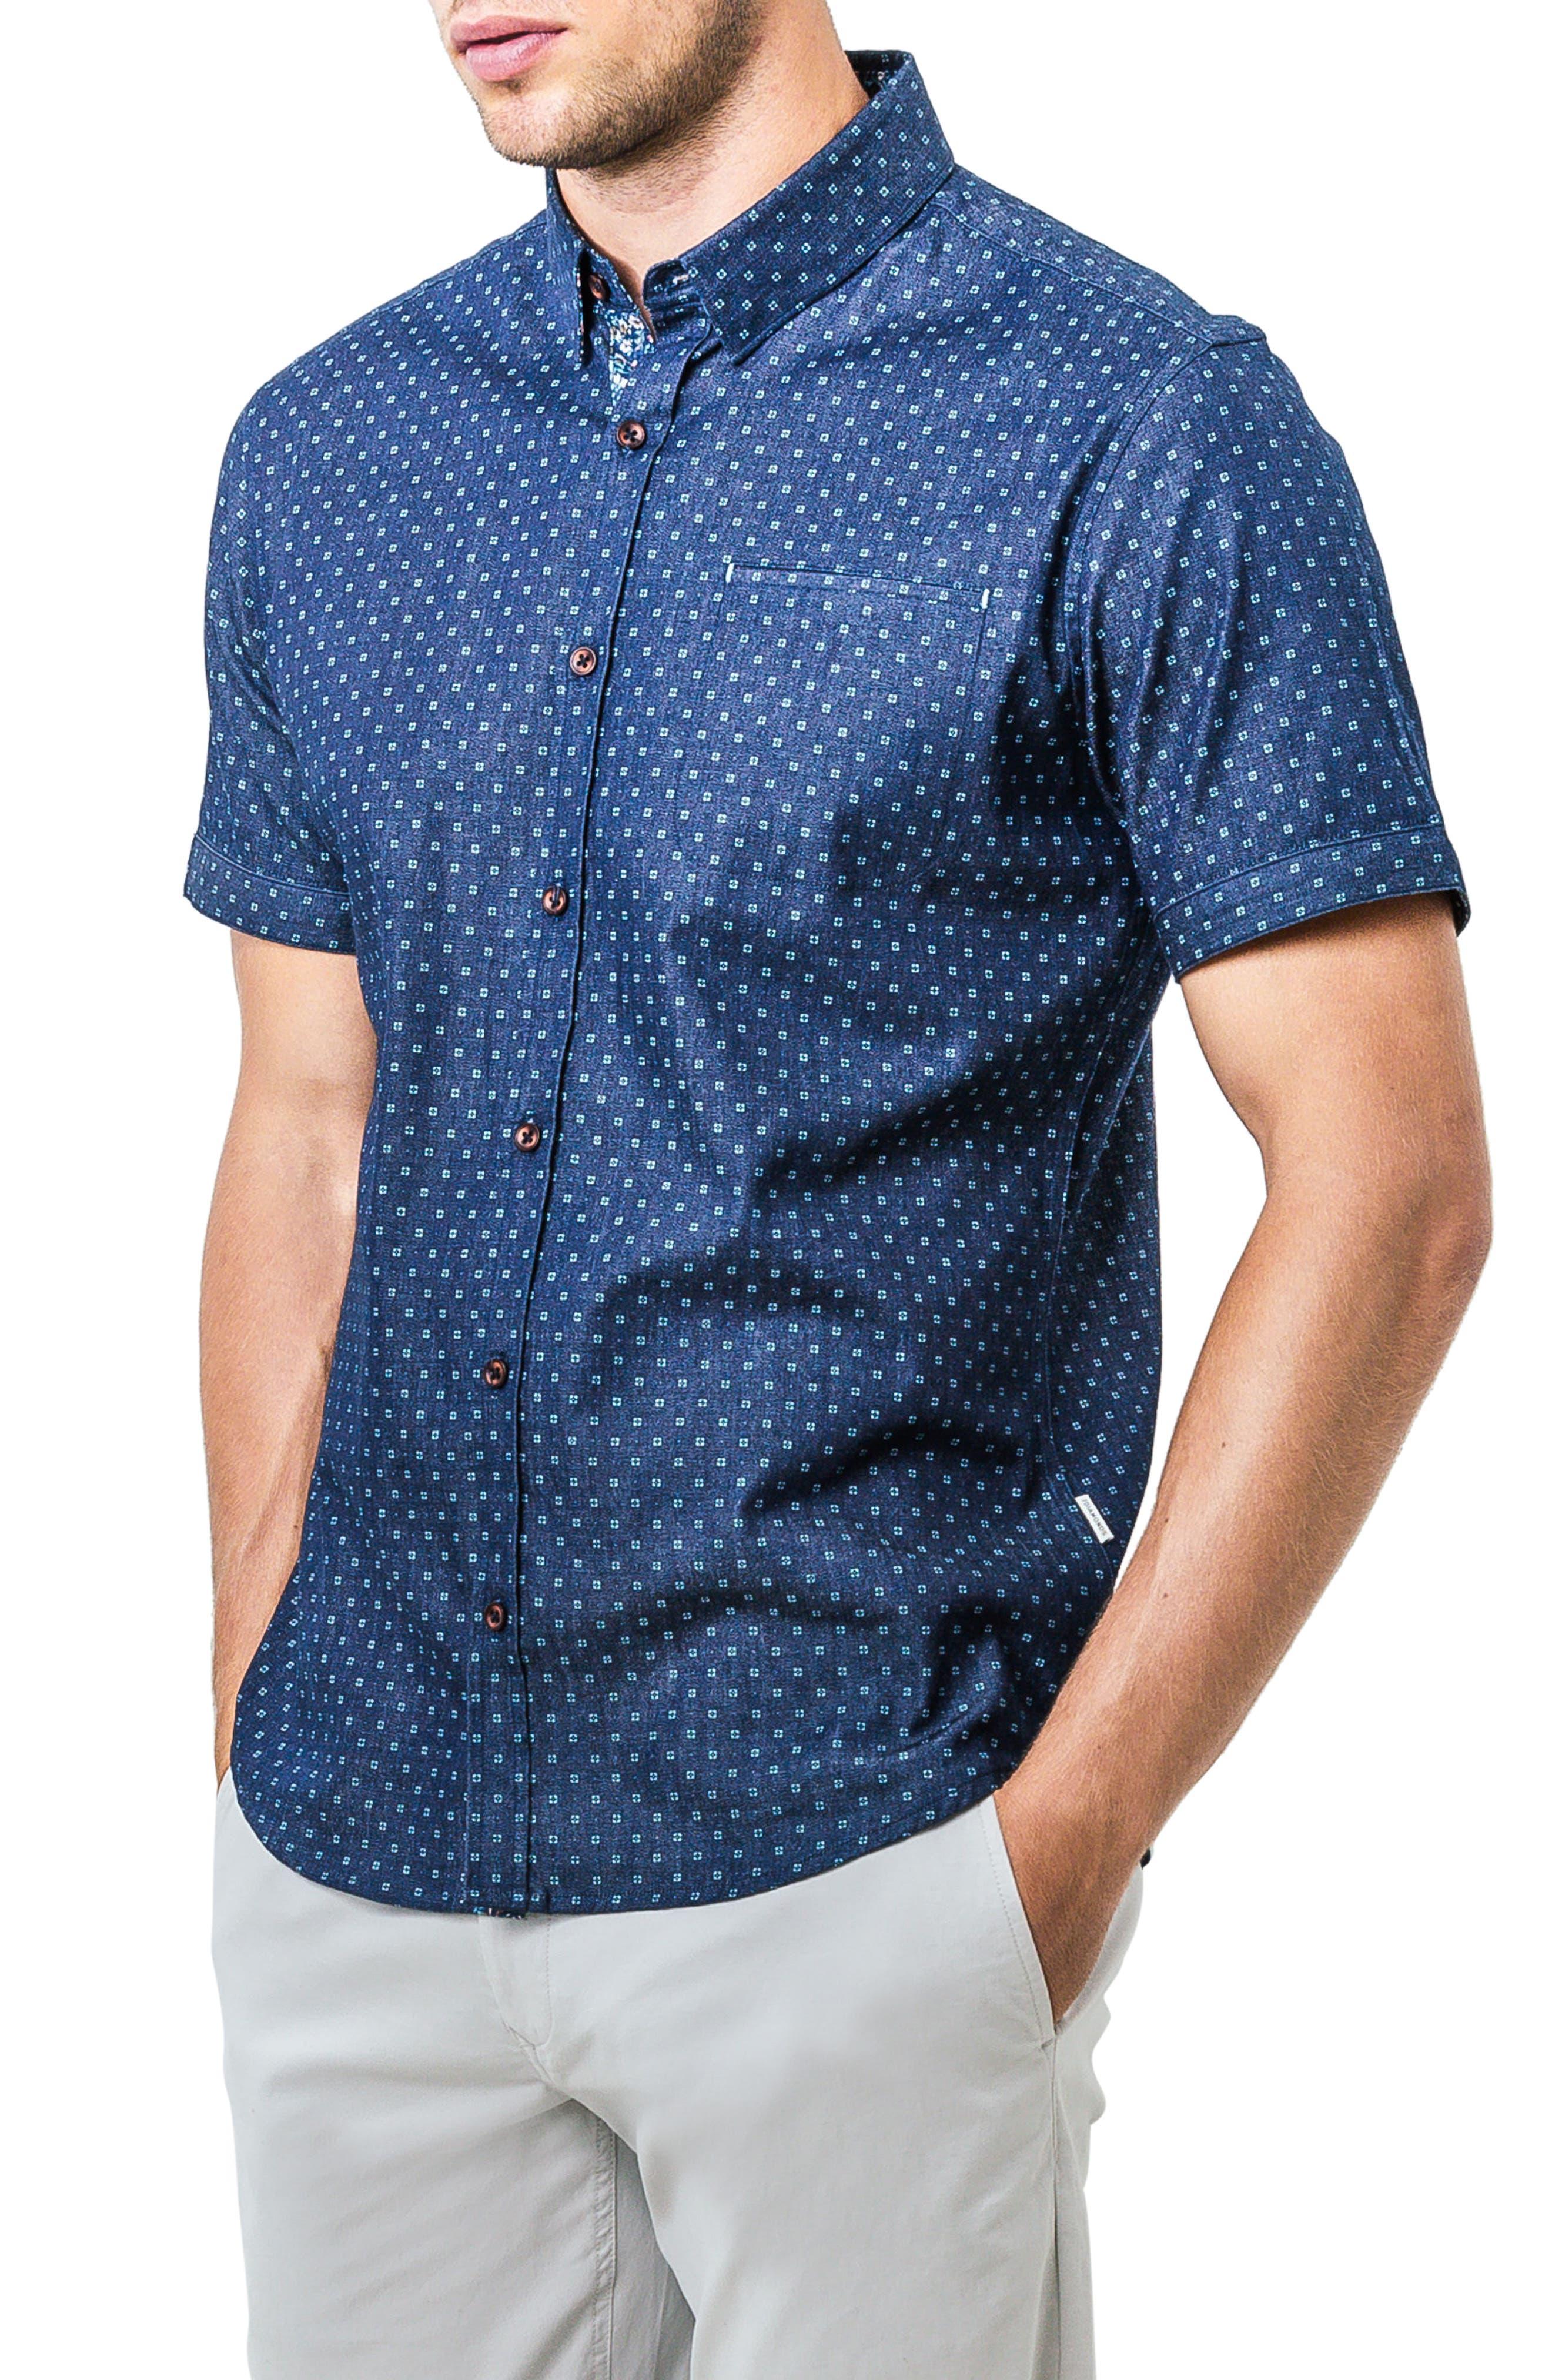 Innervision Woven Shirt,                             Alternate thumbnail 3, color,                             410